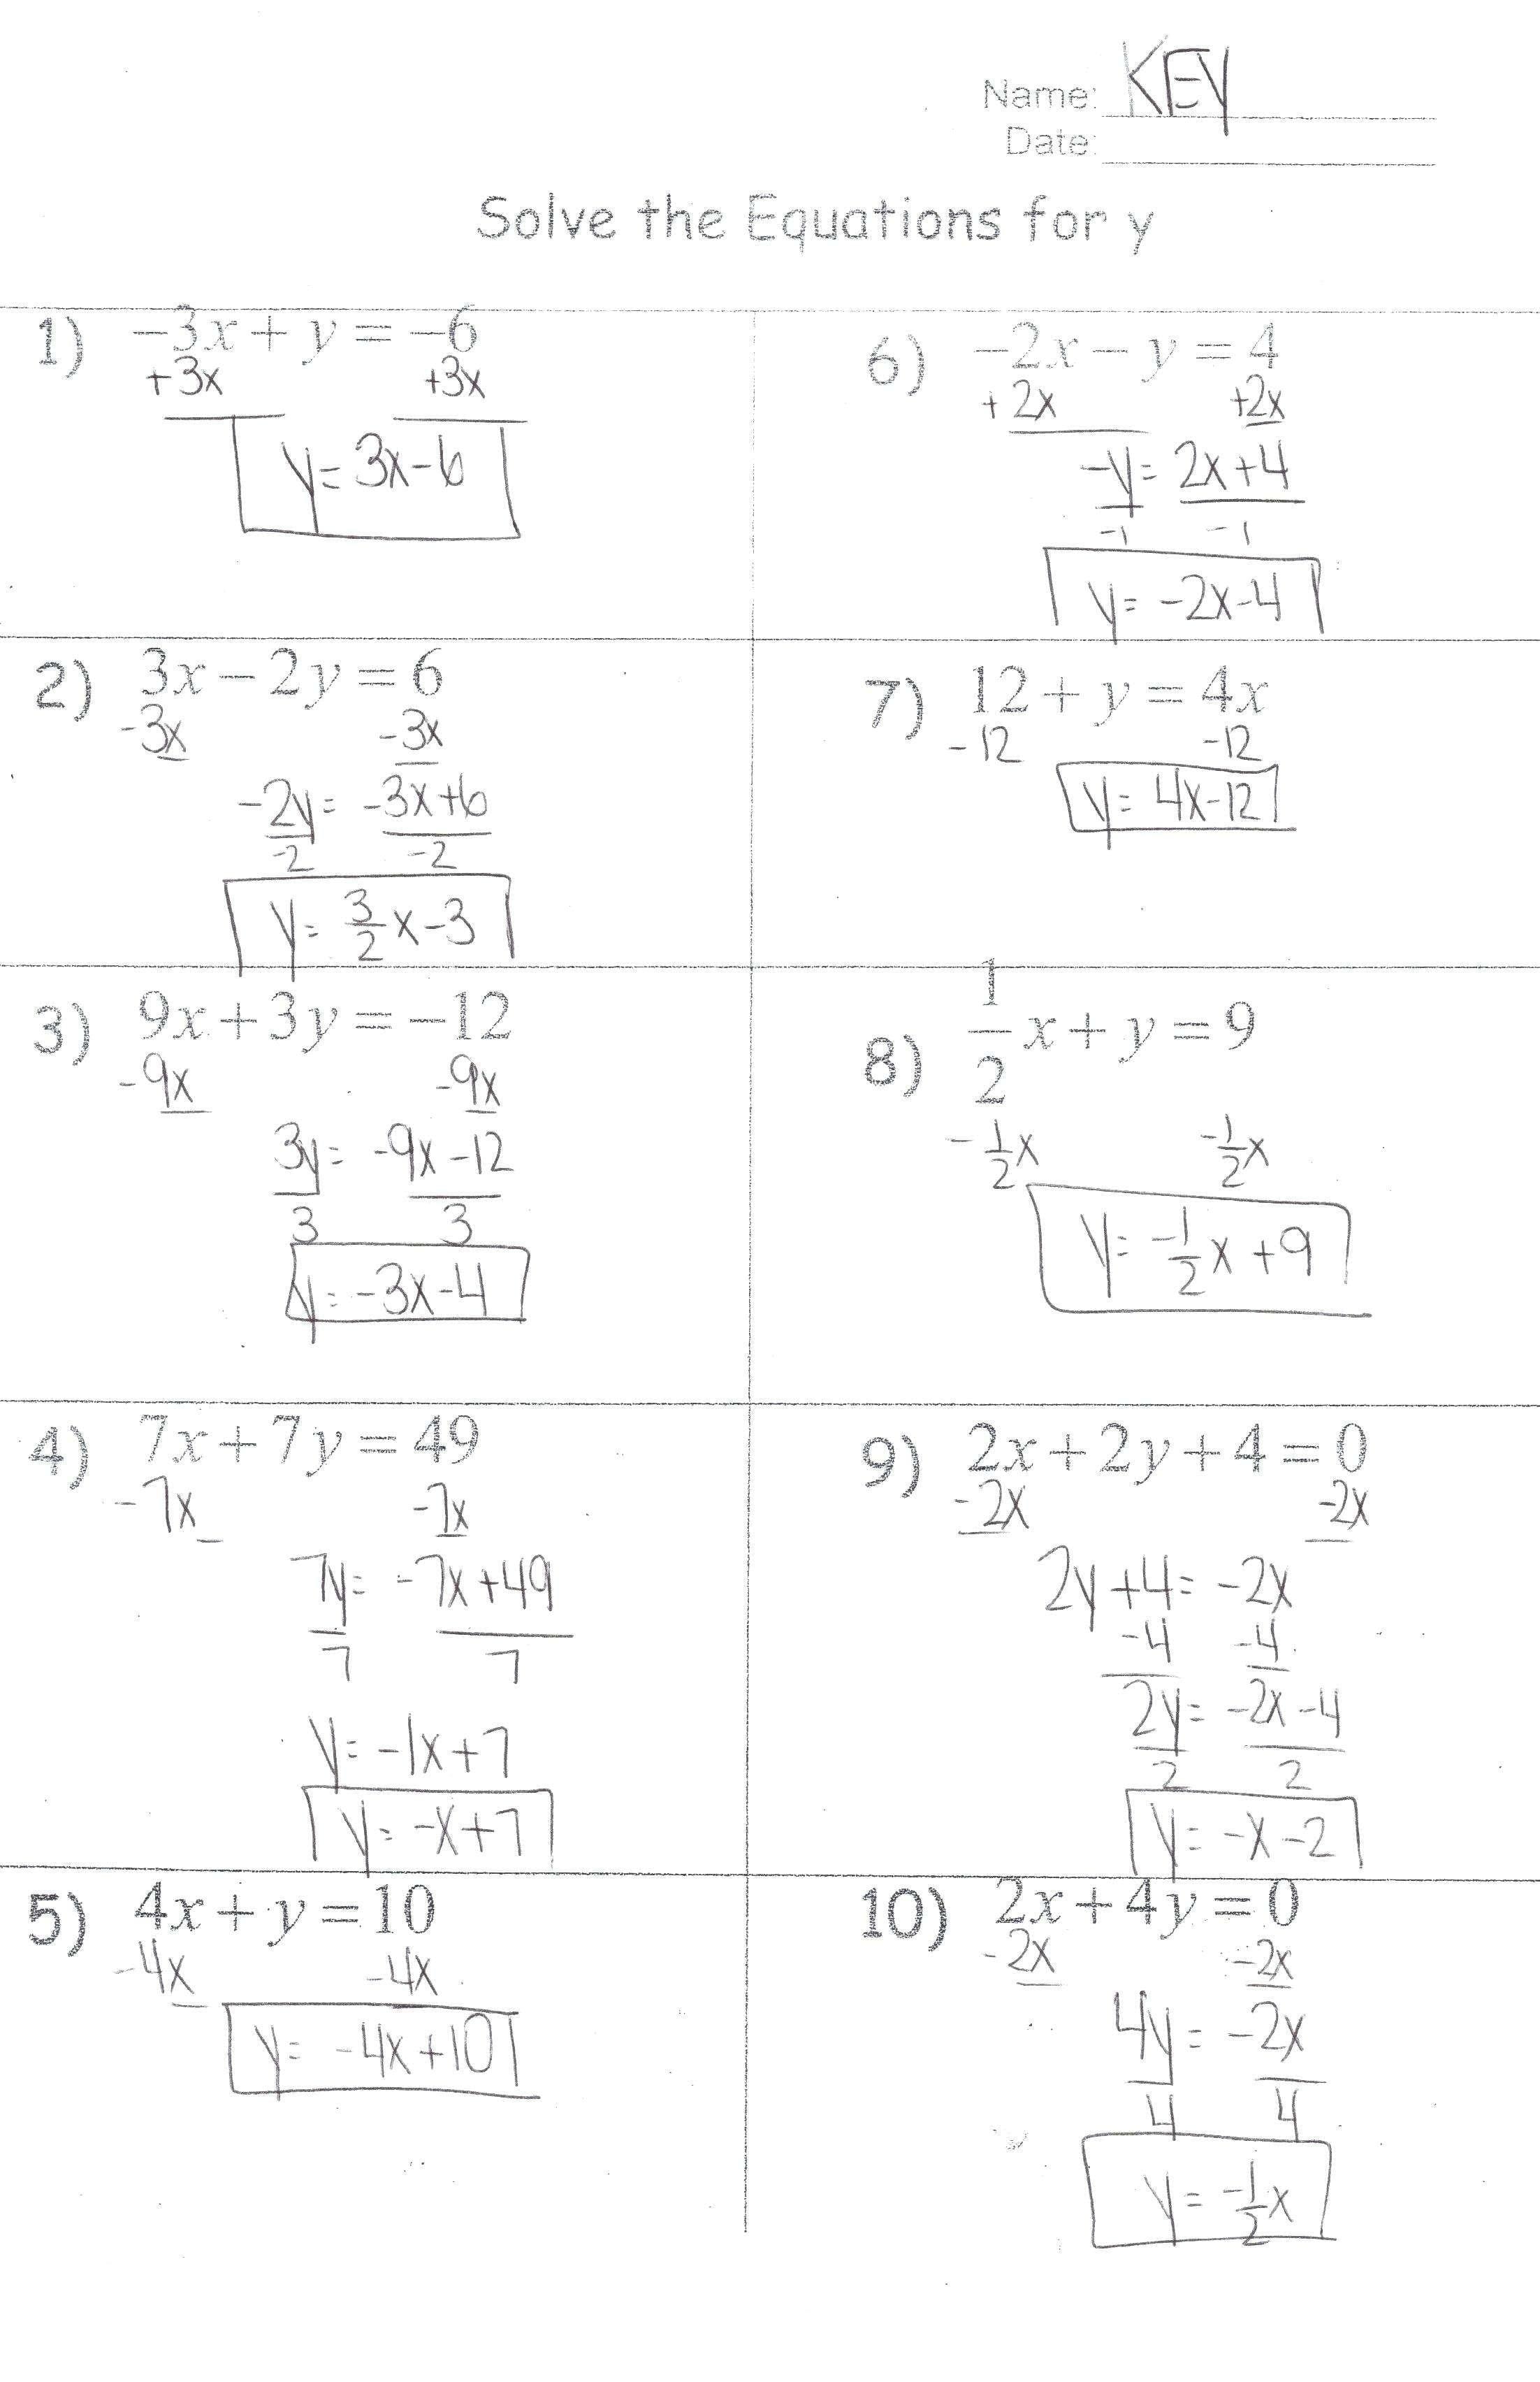 Multi Step Equations Worksheet Variables On Both Sides  Worksheet In Solving Equations With Variables On Both Sides Worksheet Answer Key